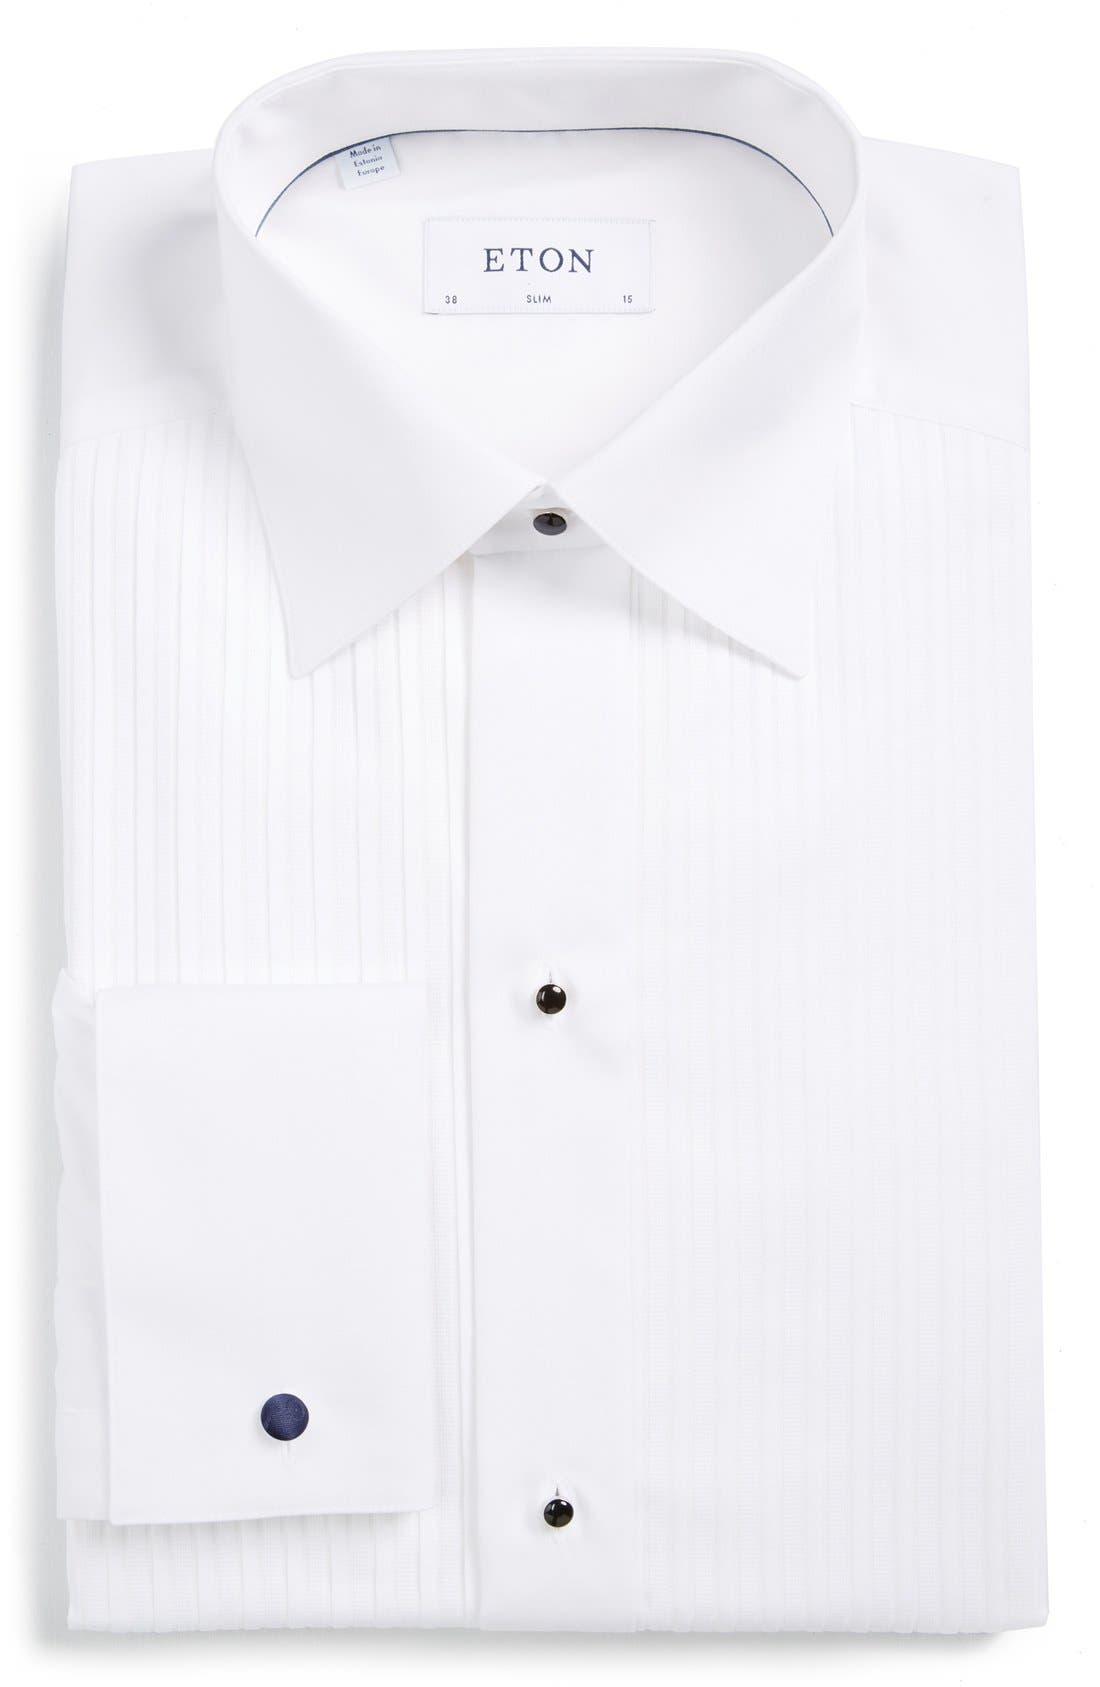 Main Image - Eton Slim Fit Tuxedo Shirt